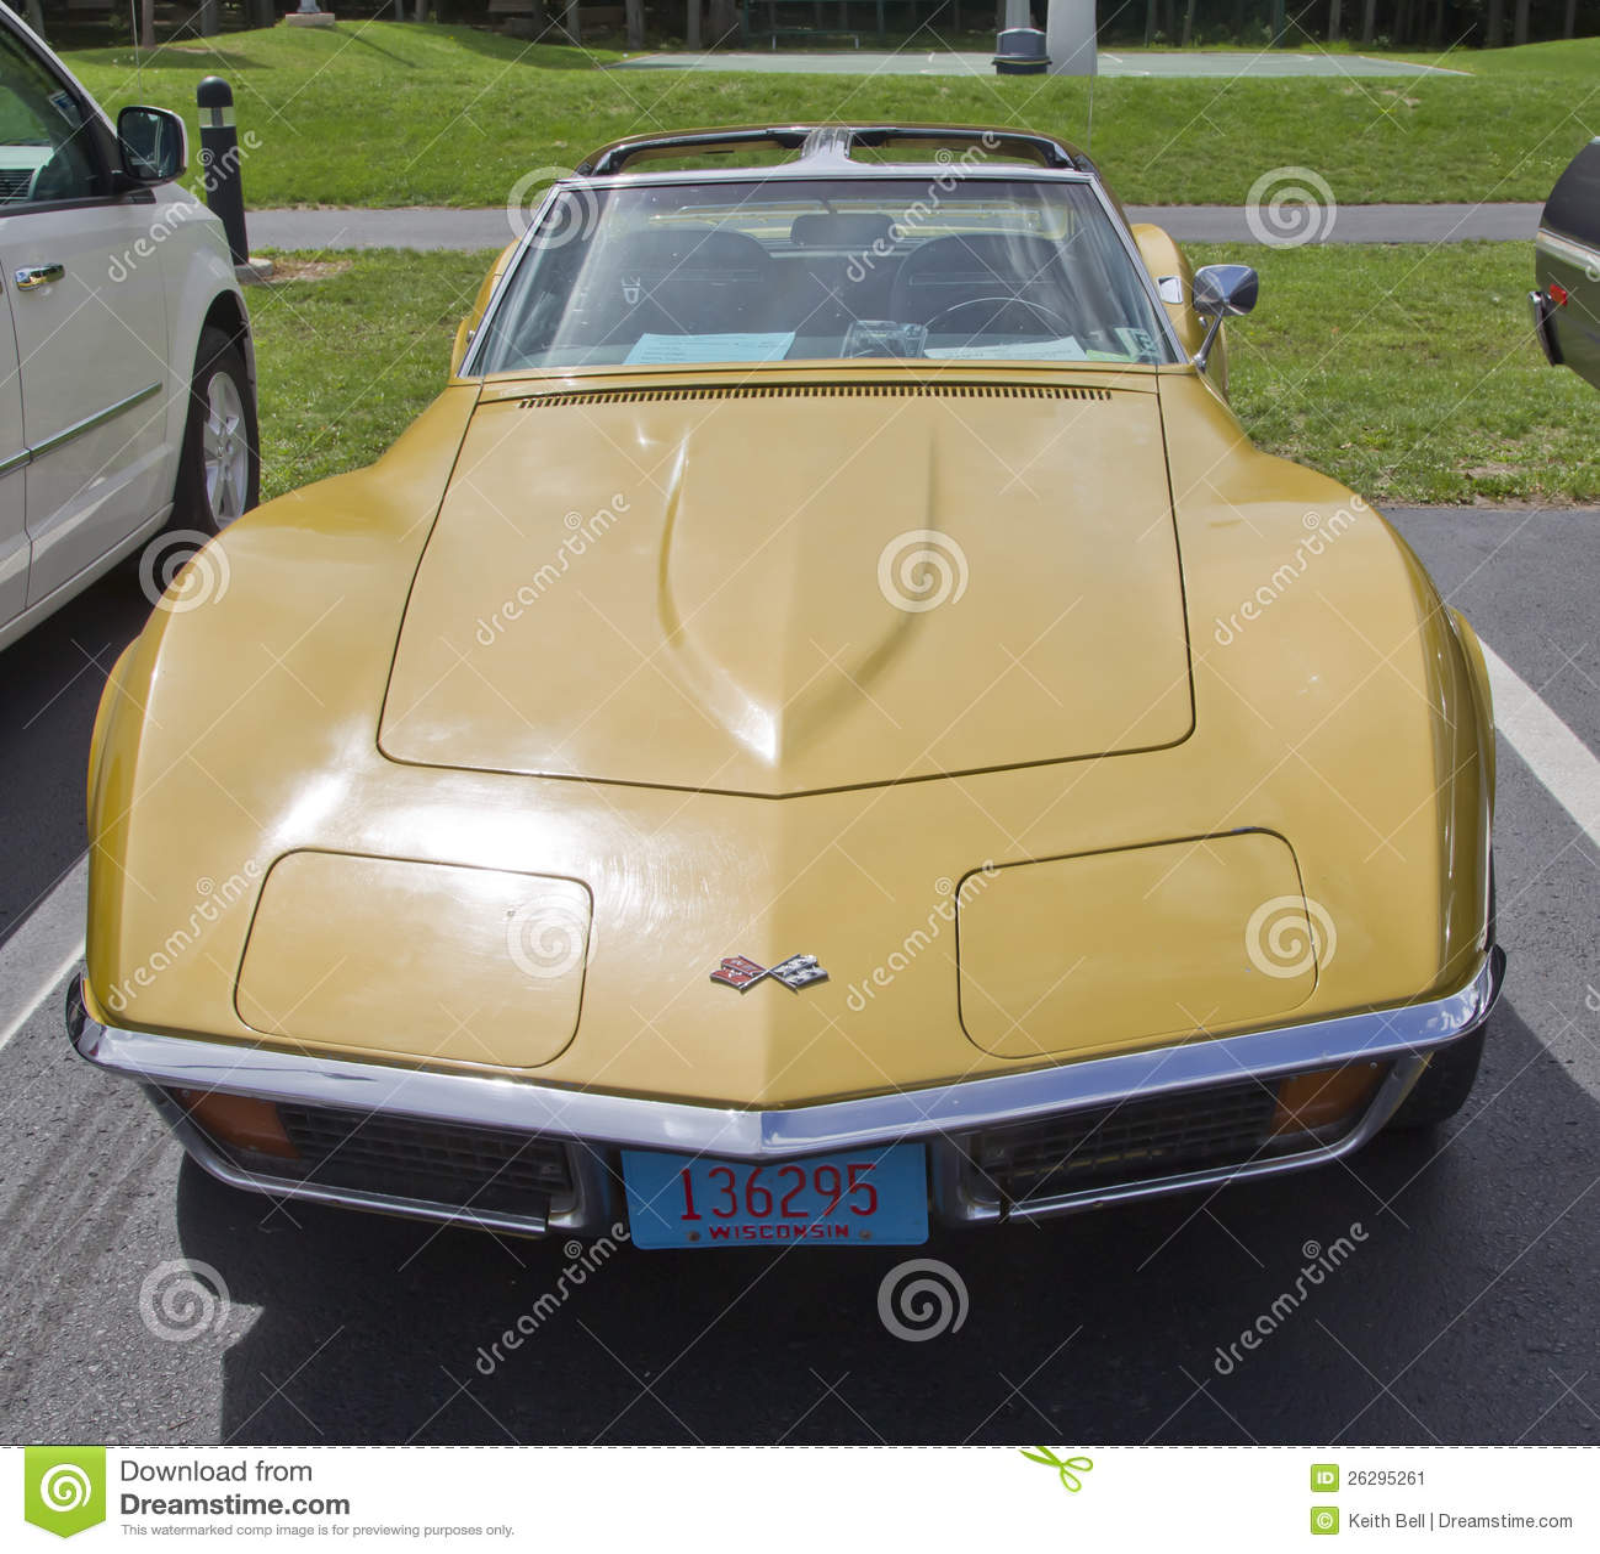 Car Show Wallpaper Download 1972 Chevrolet Corvette Stingray Front View Editorial